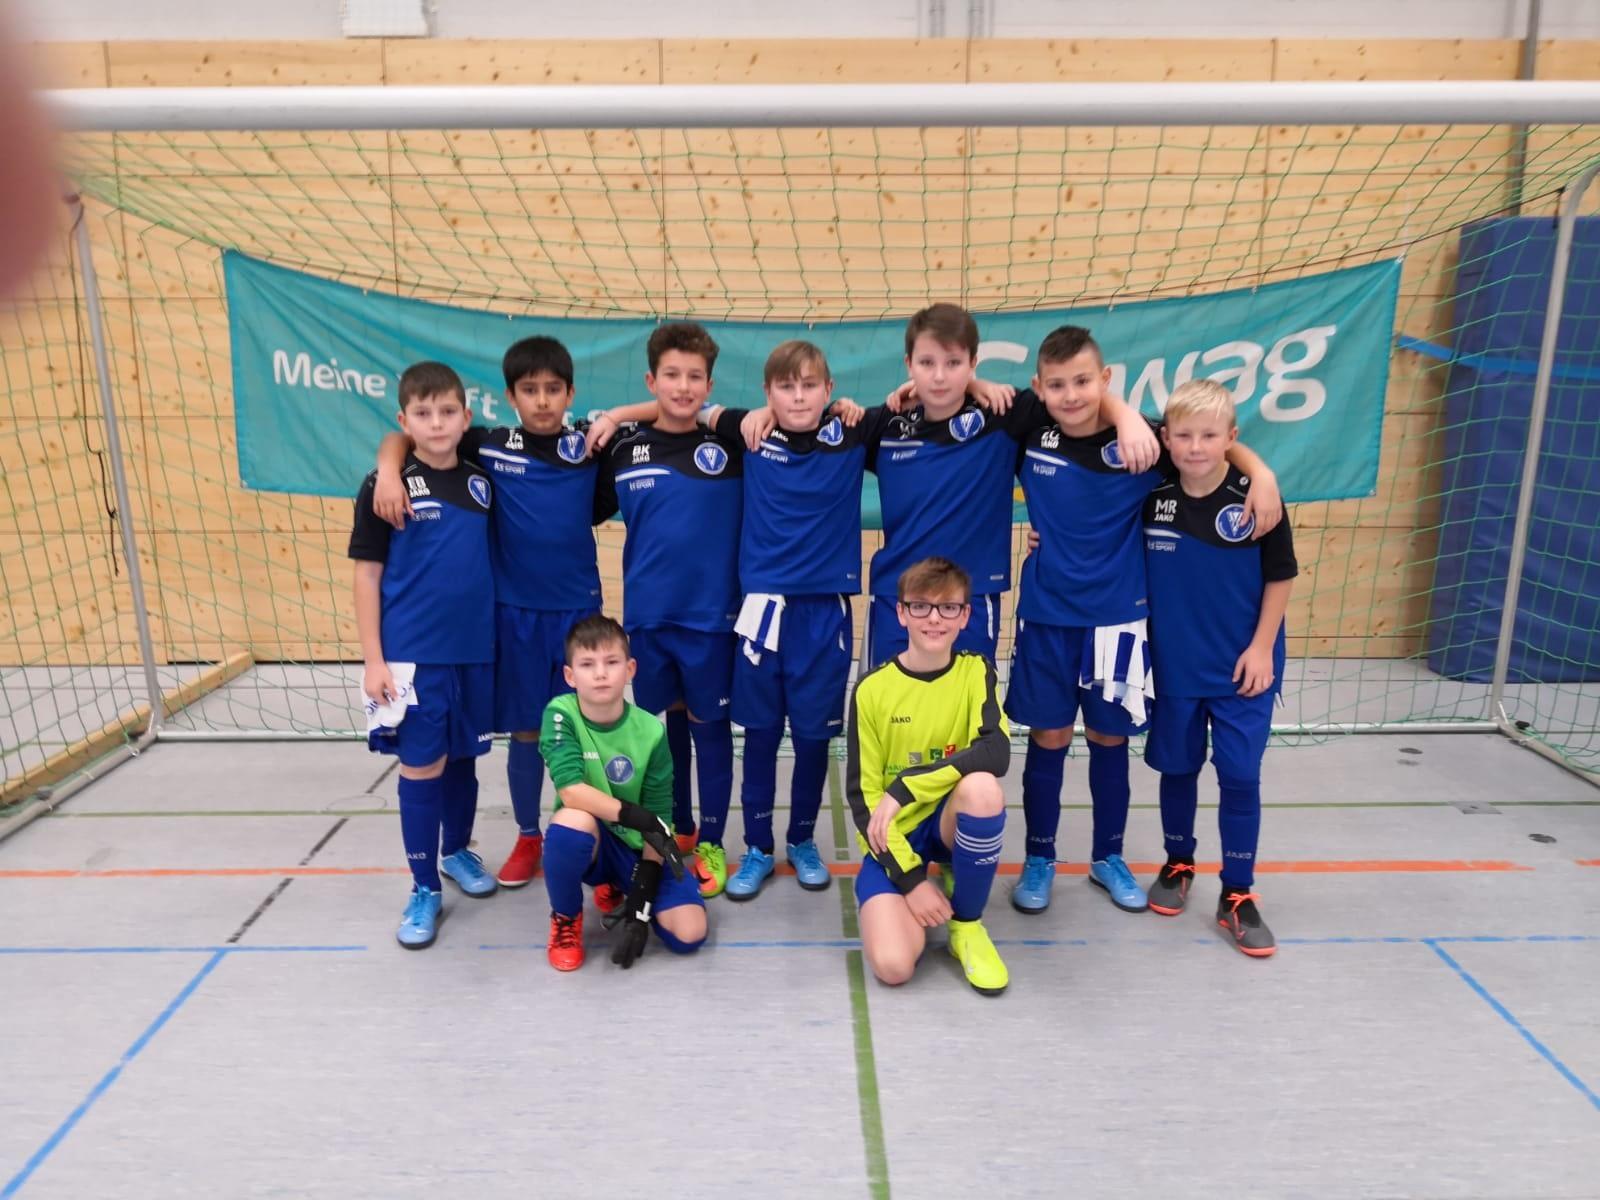 E-Junioren U11 - FC Germania Metternich - Süwag Hallencup 2020